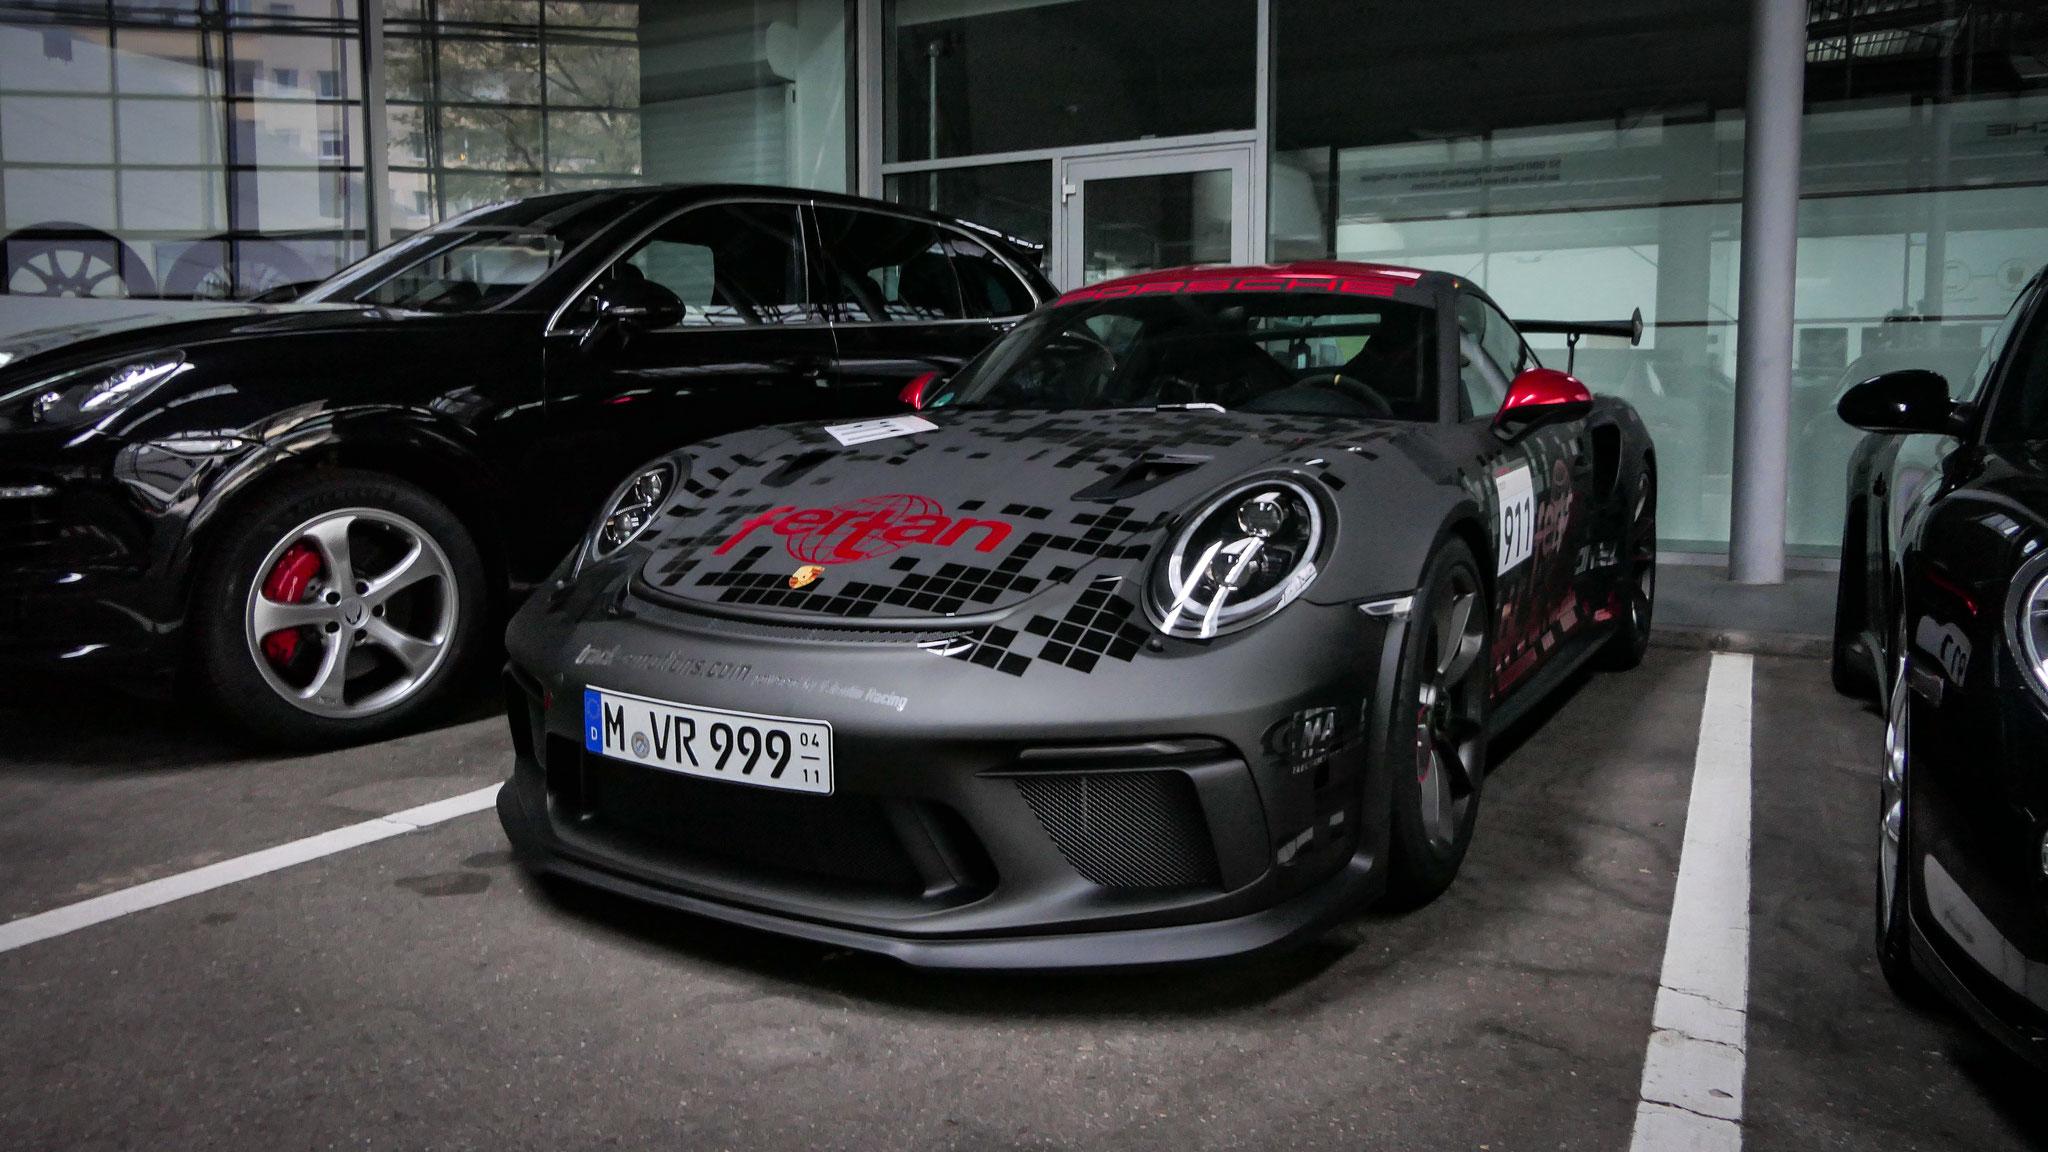 Porsche 911 991.2 GT3 RS - M-VR-999